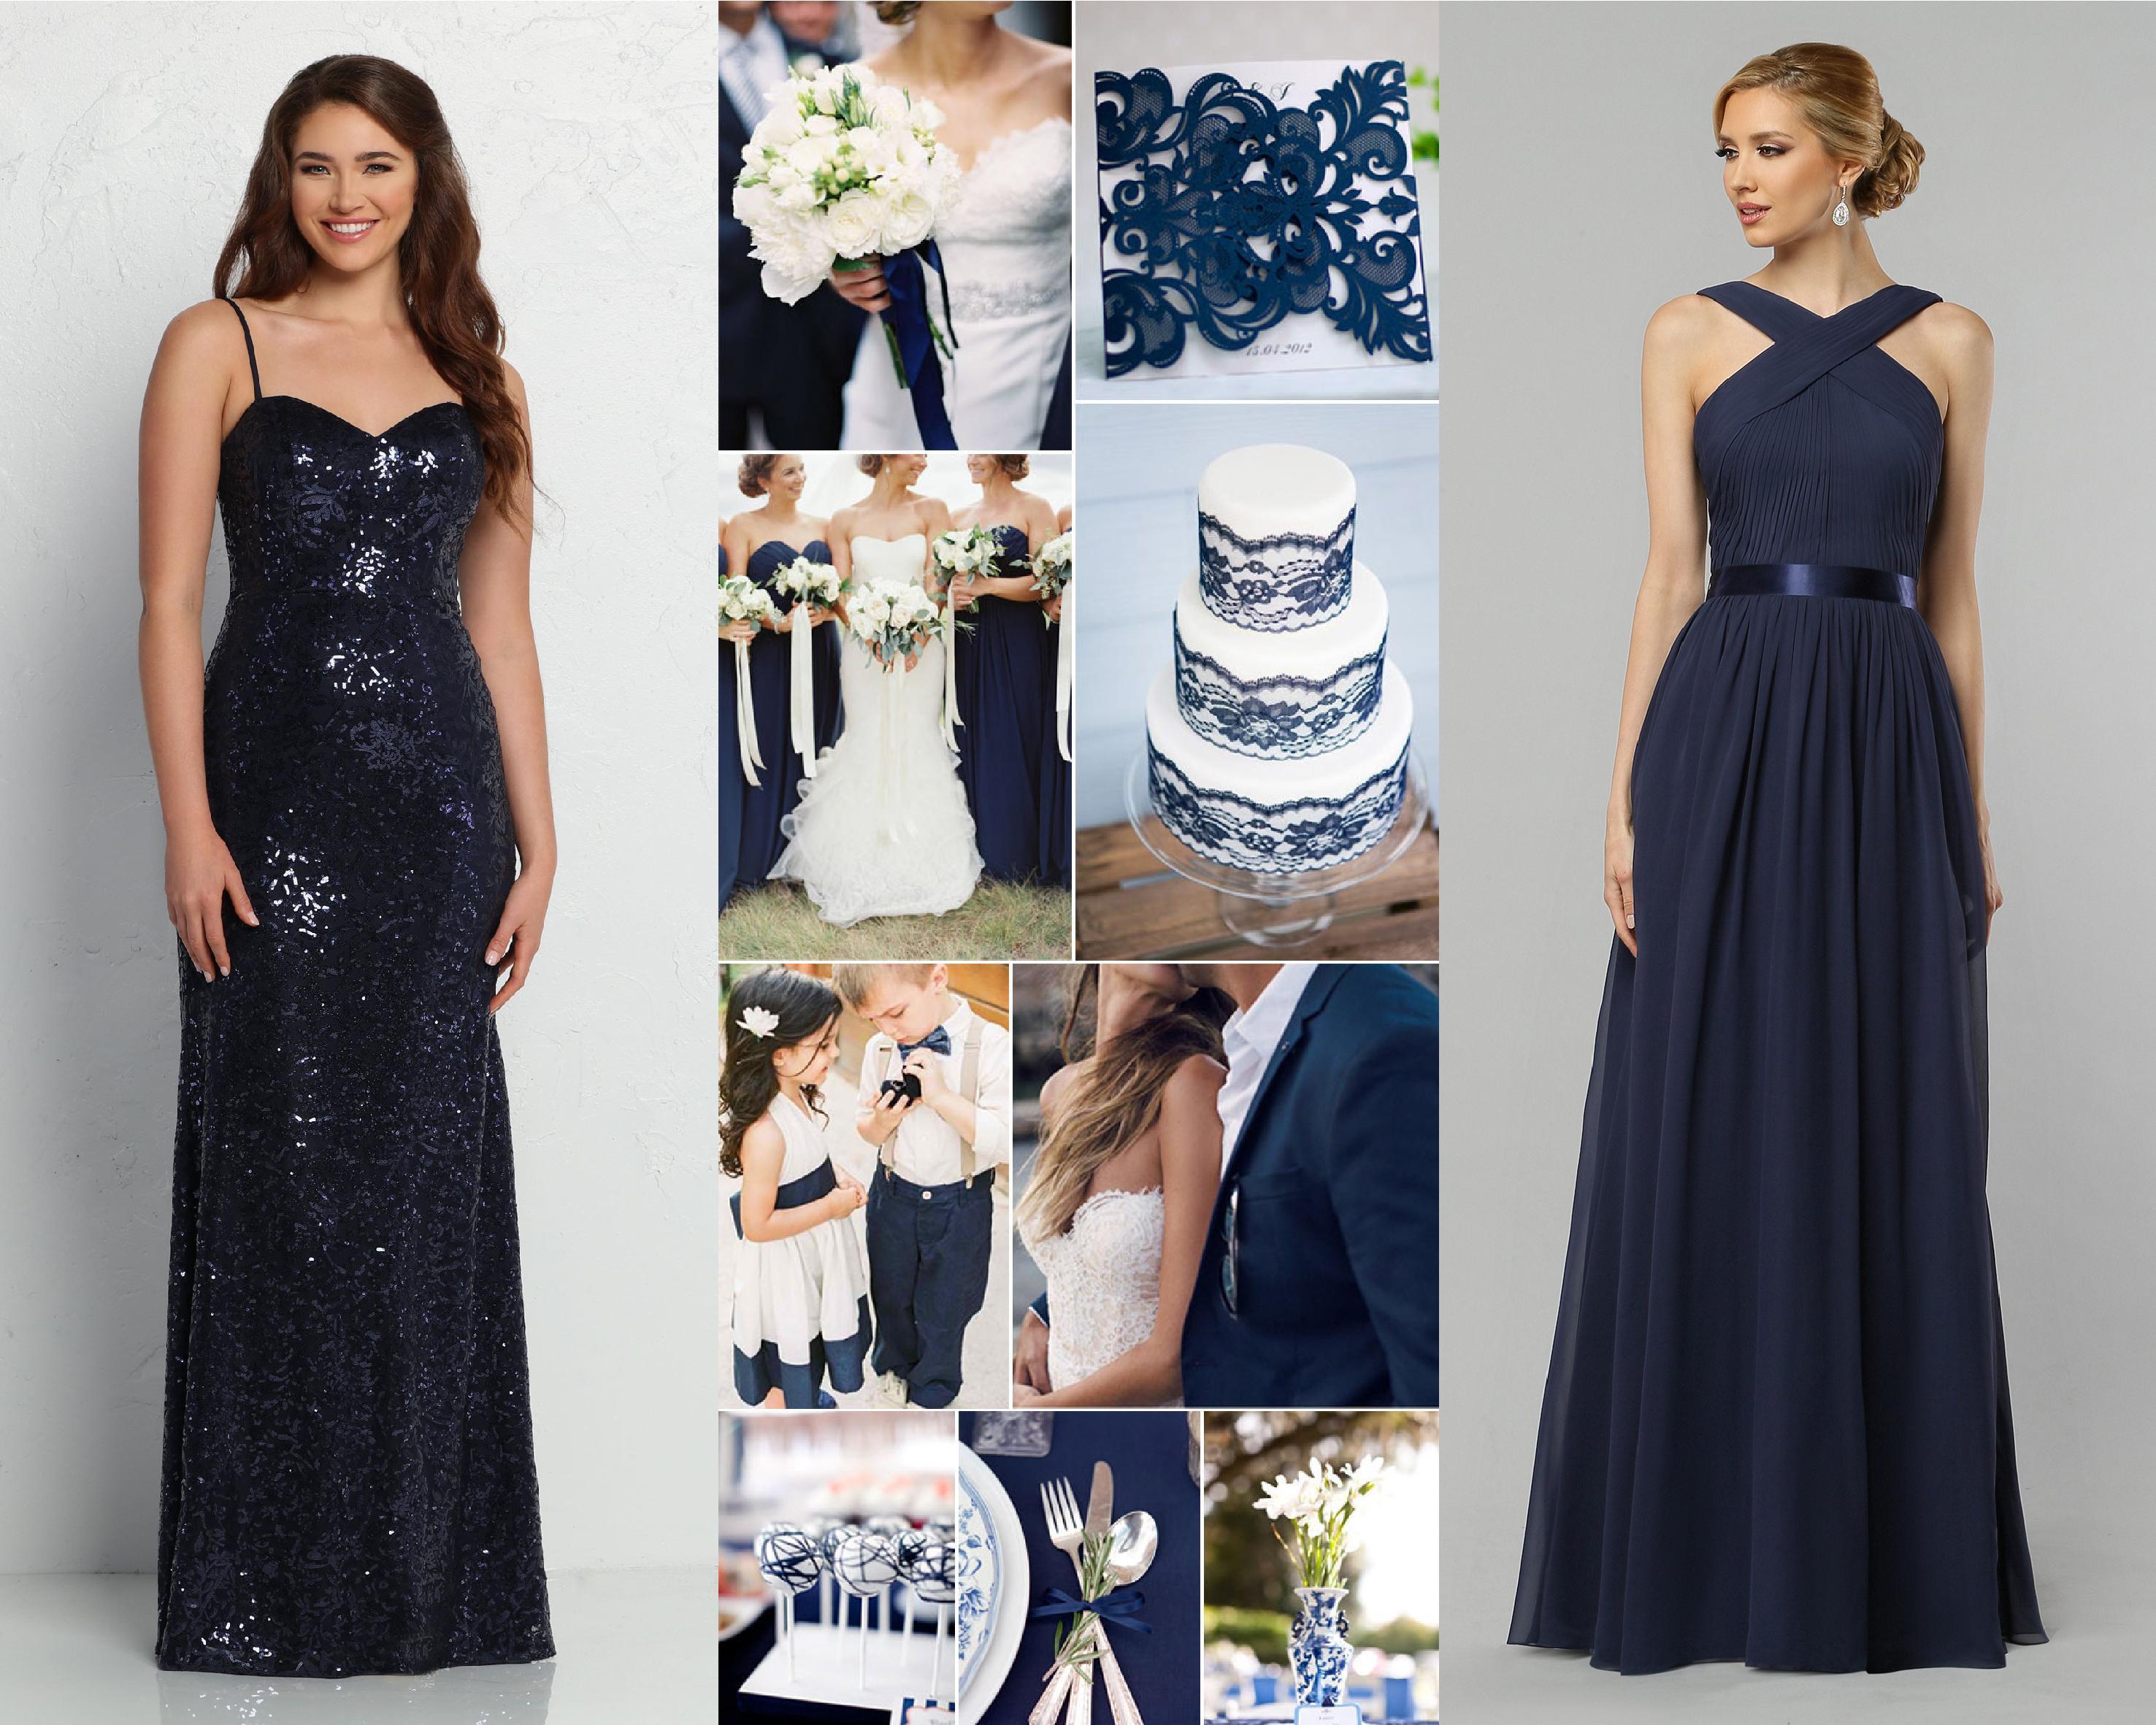 Classic Wedding Color Scheme White With Blue Bridesmaid Dresses Davinci Bridal Blog,Reception Indo Western Dress For Wedding